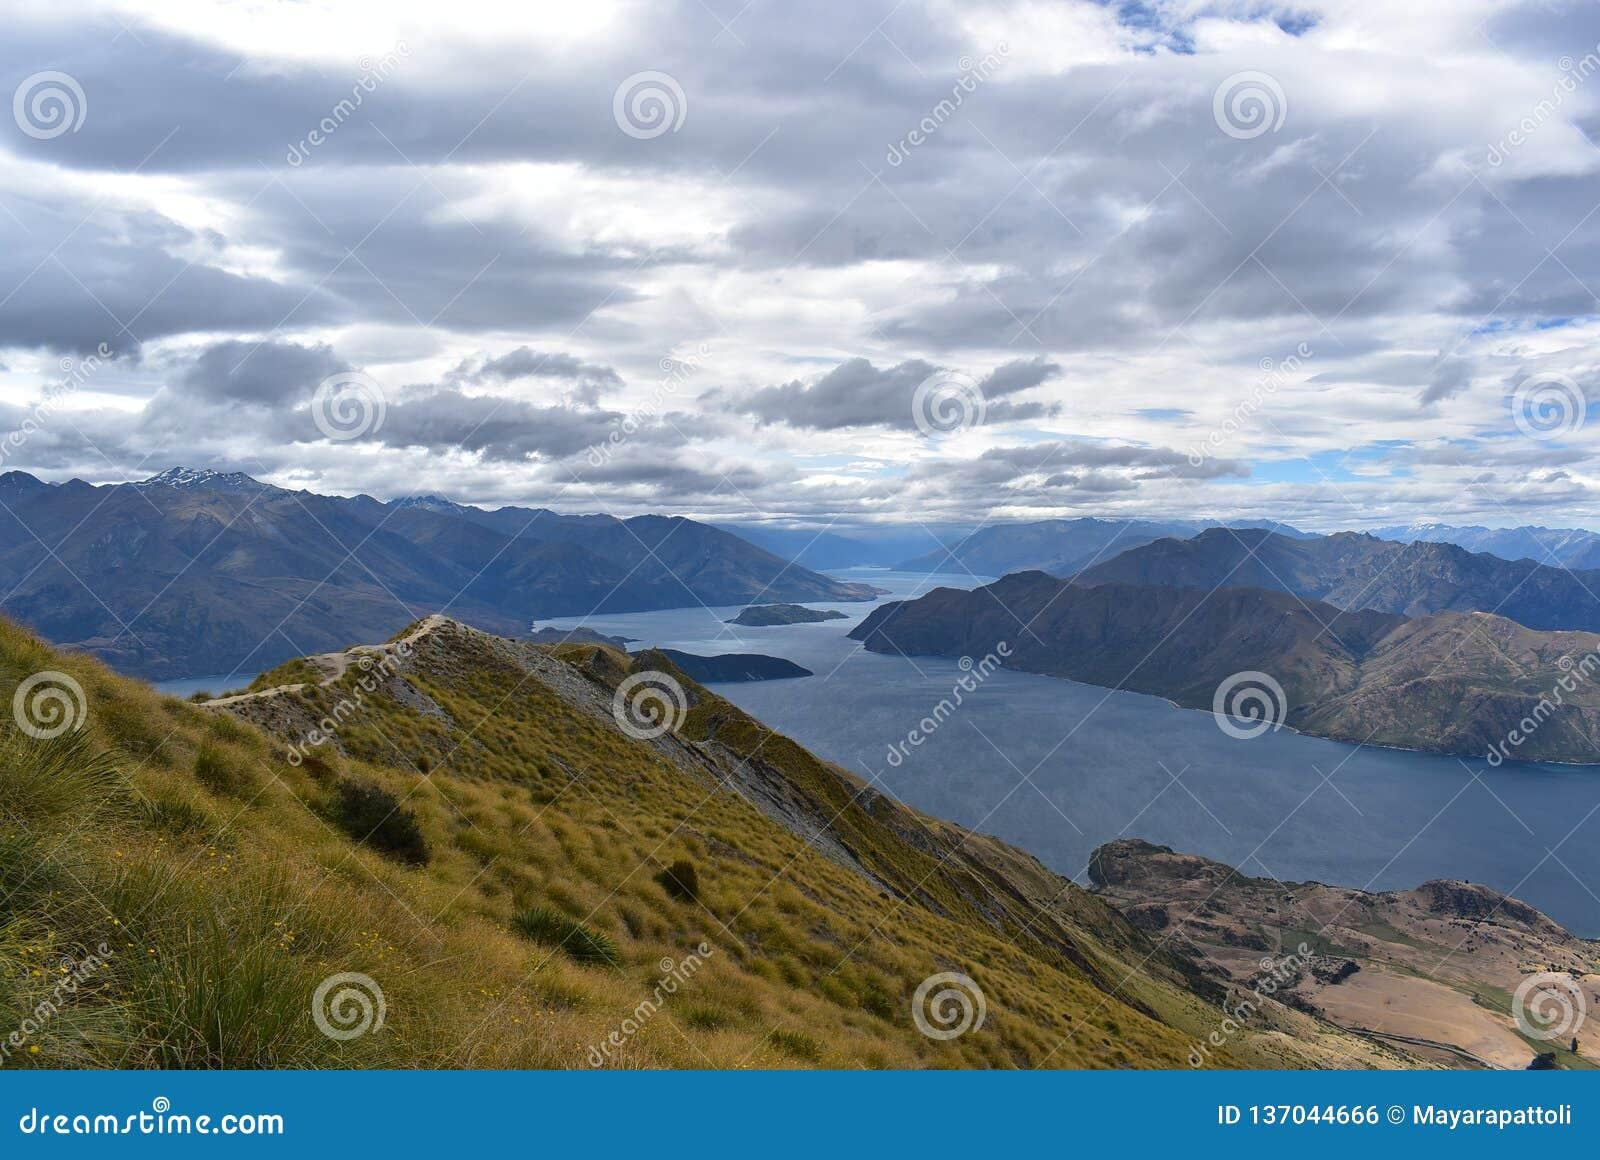 Landscape of Roys Peak, South Island of New Zealand.